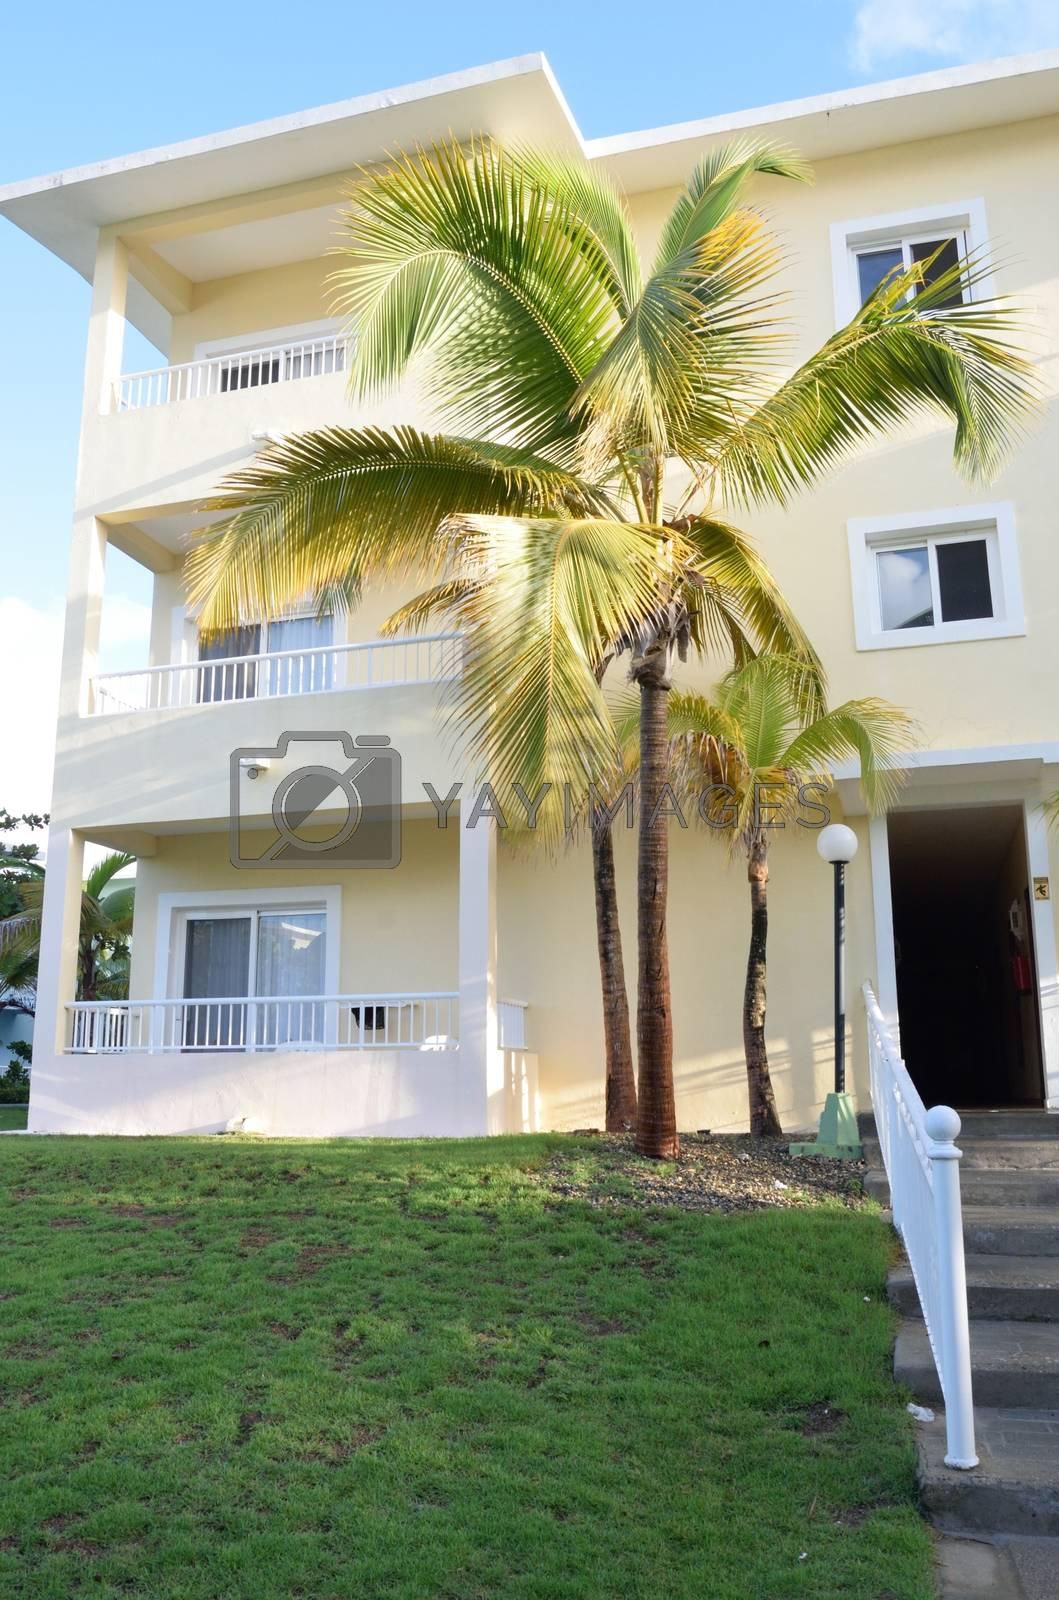 Hotel room block in caribbean